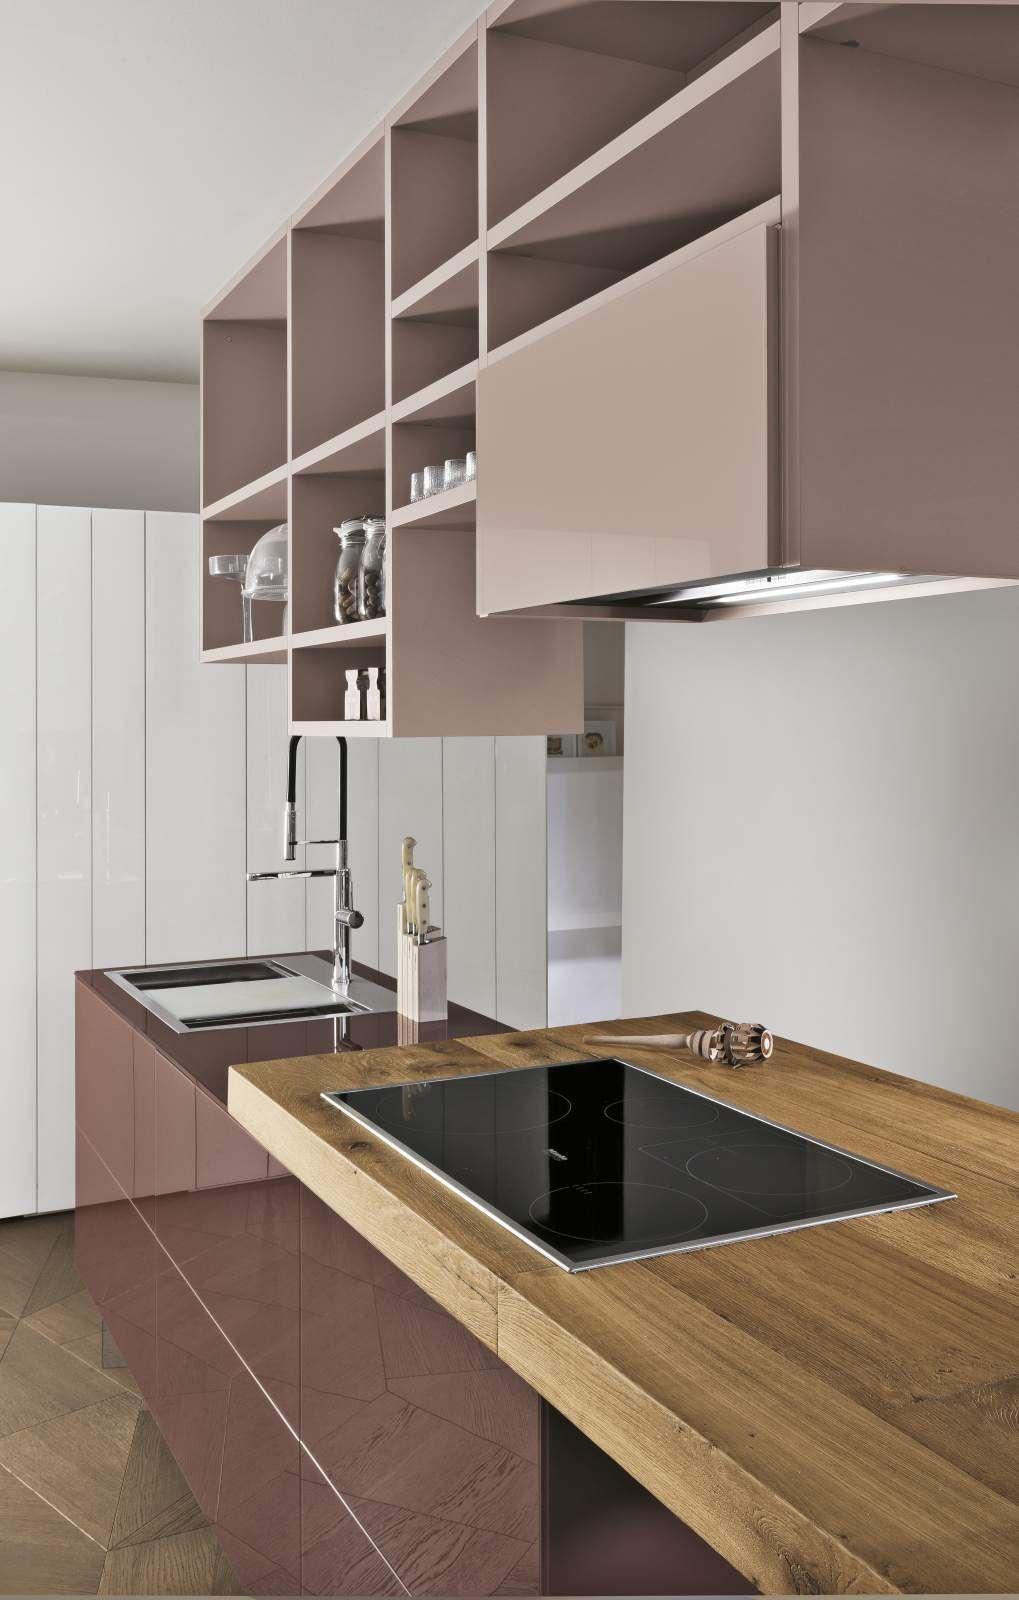 Arredamento per la Cucina: scopri i nostri modelli di cucine ...